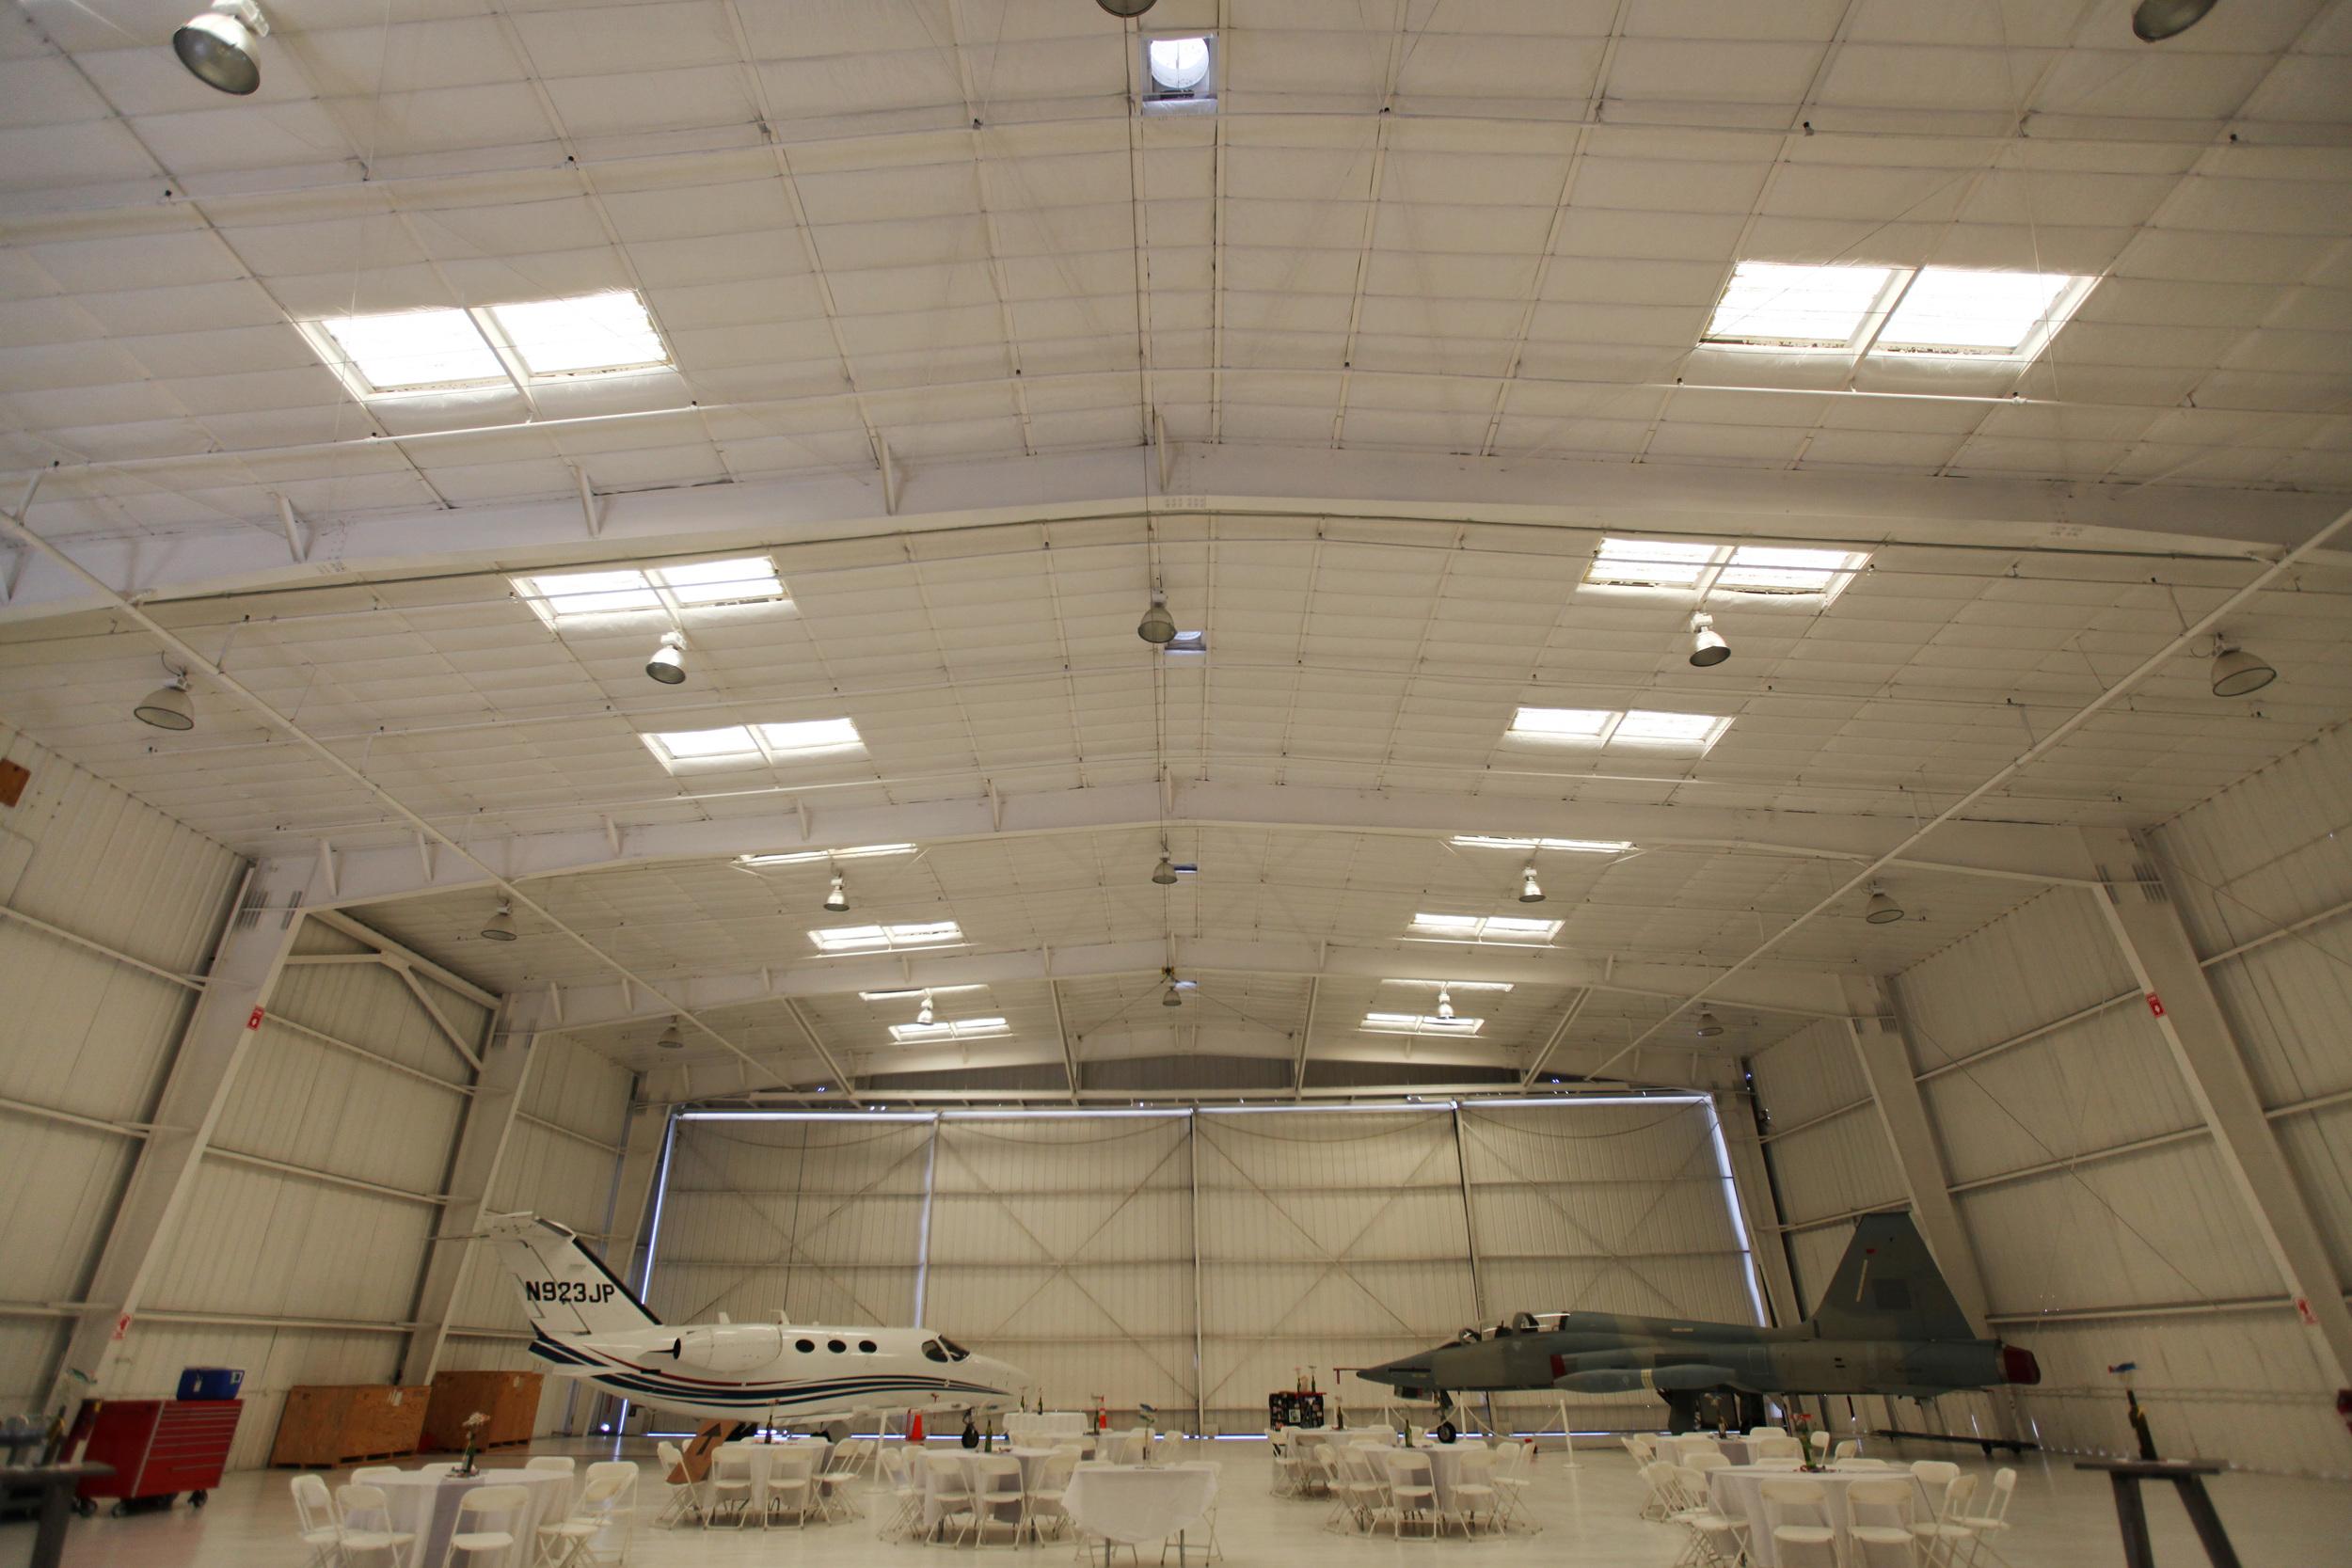 van nuys airport hangar wedding